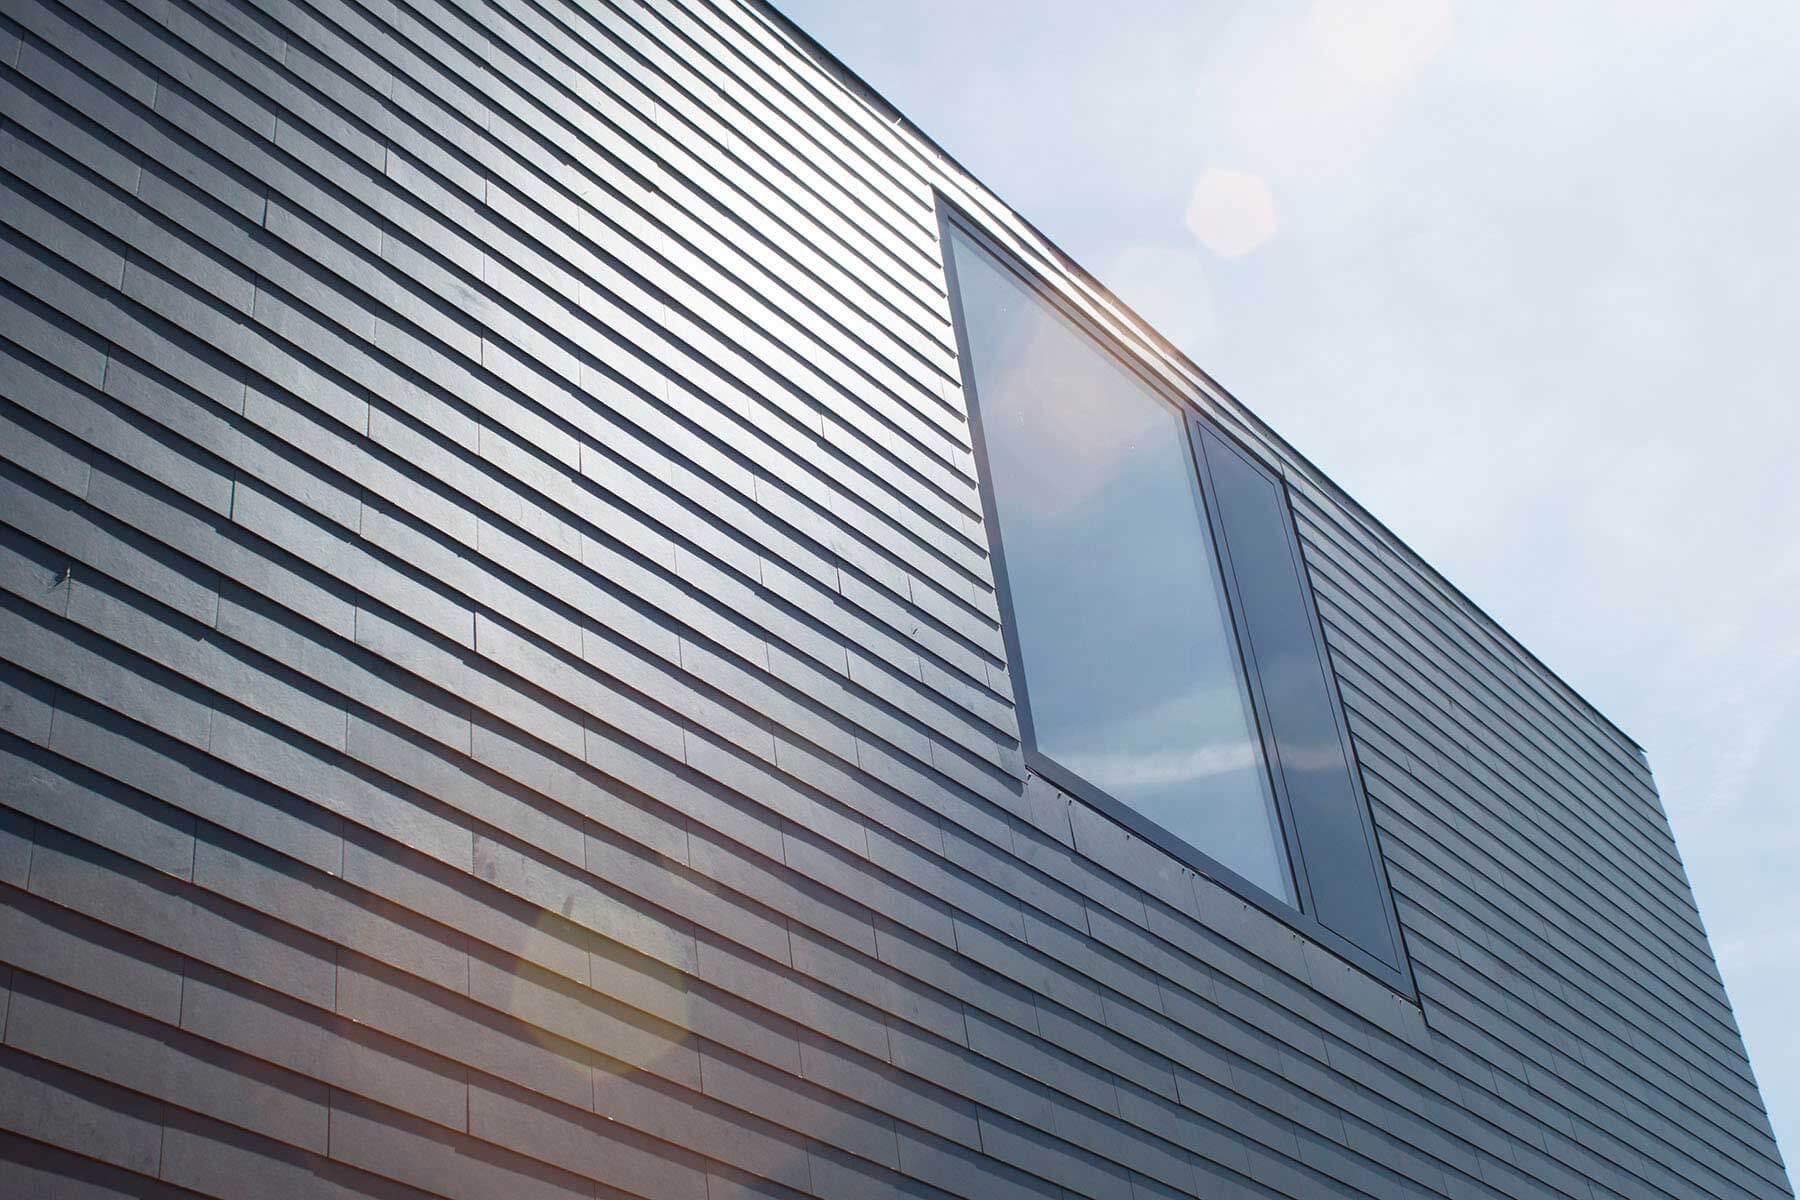 8A-Architecten-datcha-house-4-Lent-06